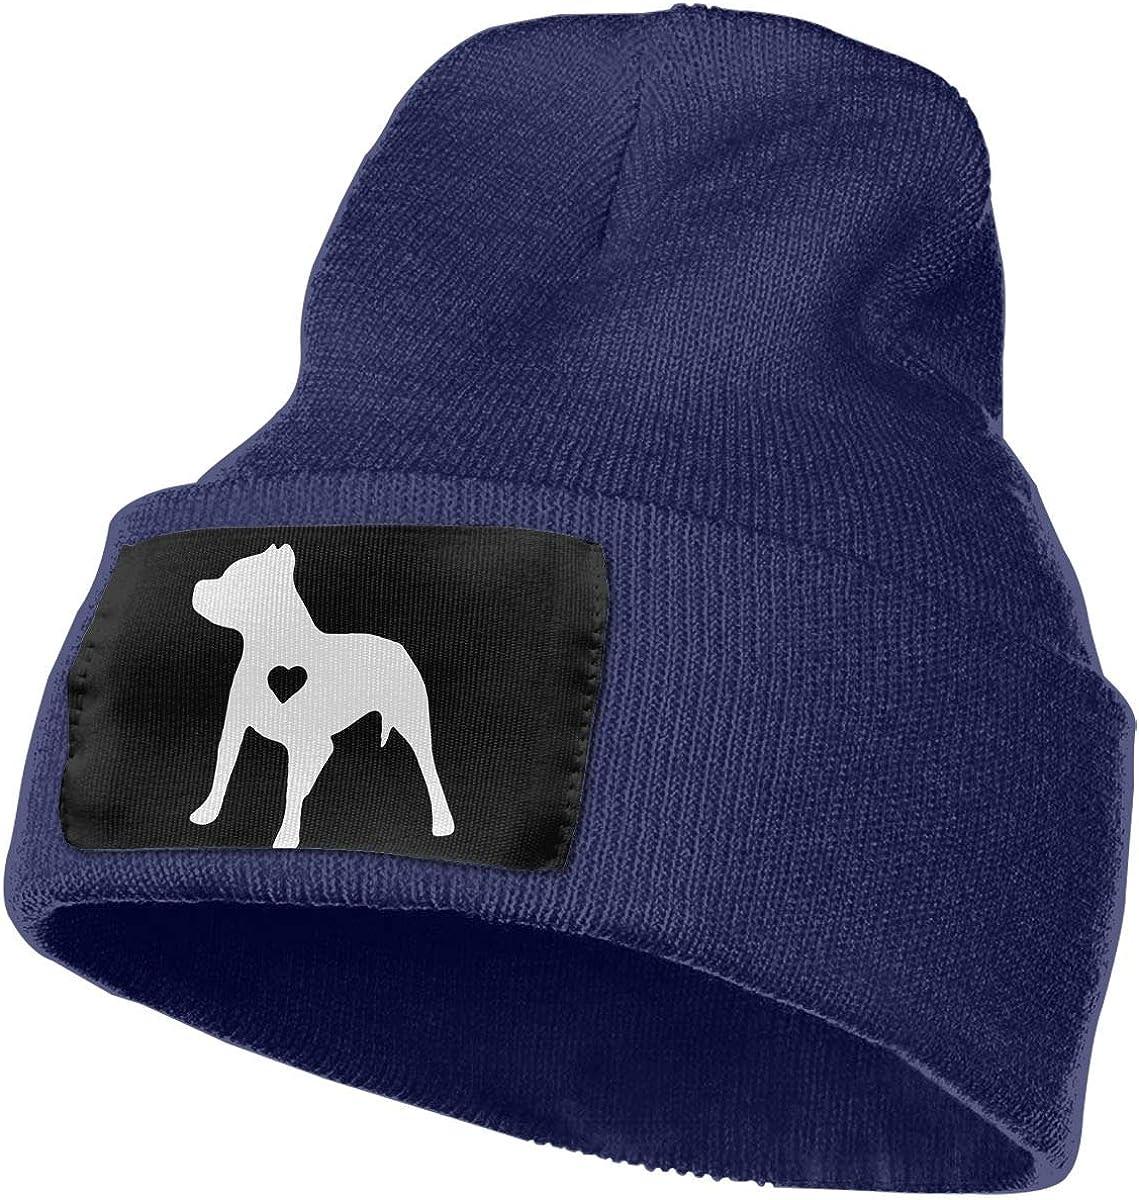 Mens and Womens 100/% Acrylic Knit Hat Cap Love Pitbull Warm Skull Beanie